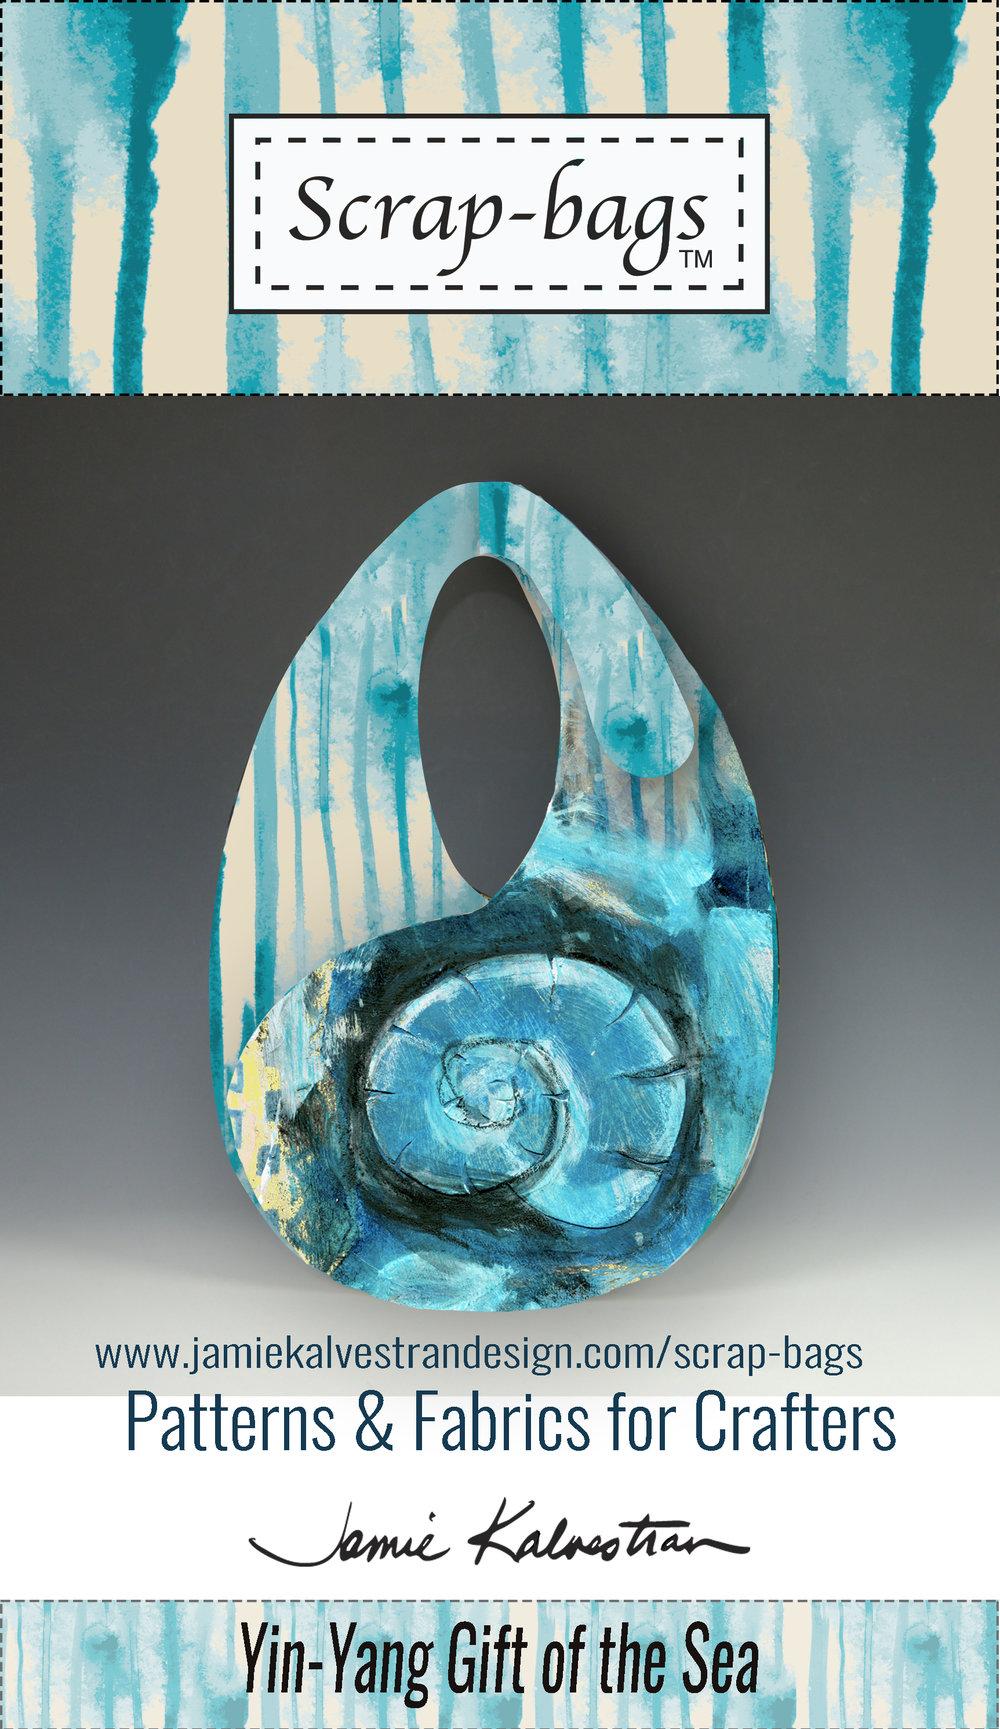 YinYang_Gift_of_the_Sea_Jamie_Kalvestran_Scrap-bags-V.jpg